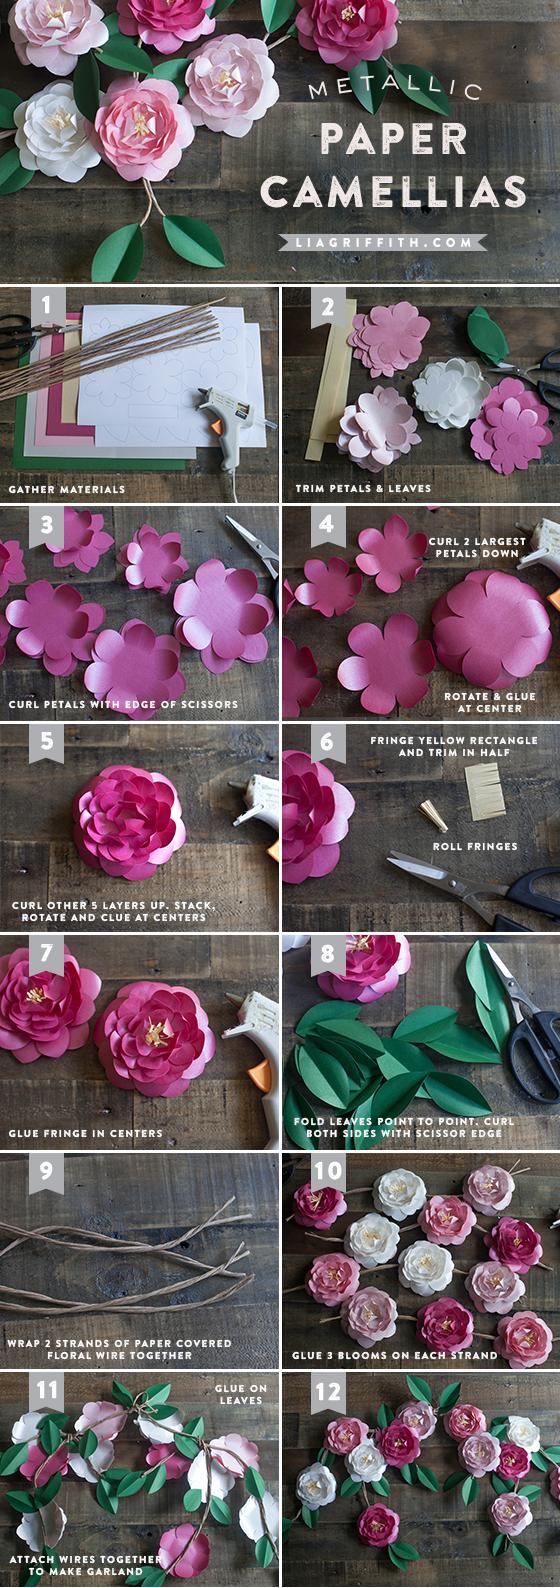 DIY paper Camellias flower tutorial